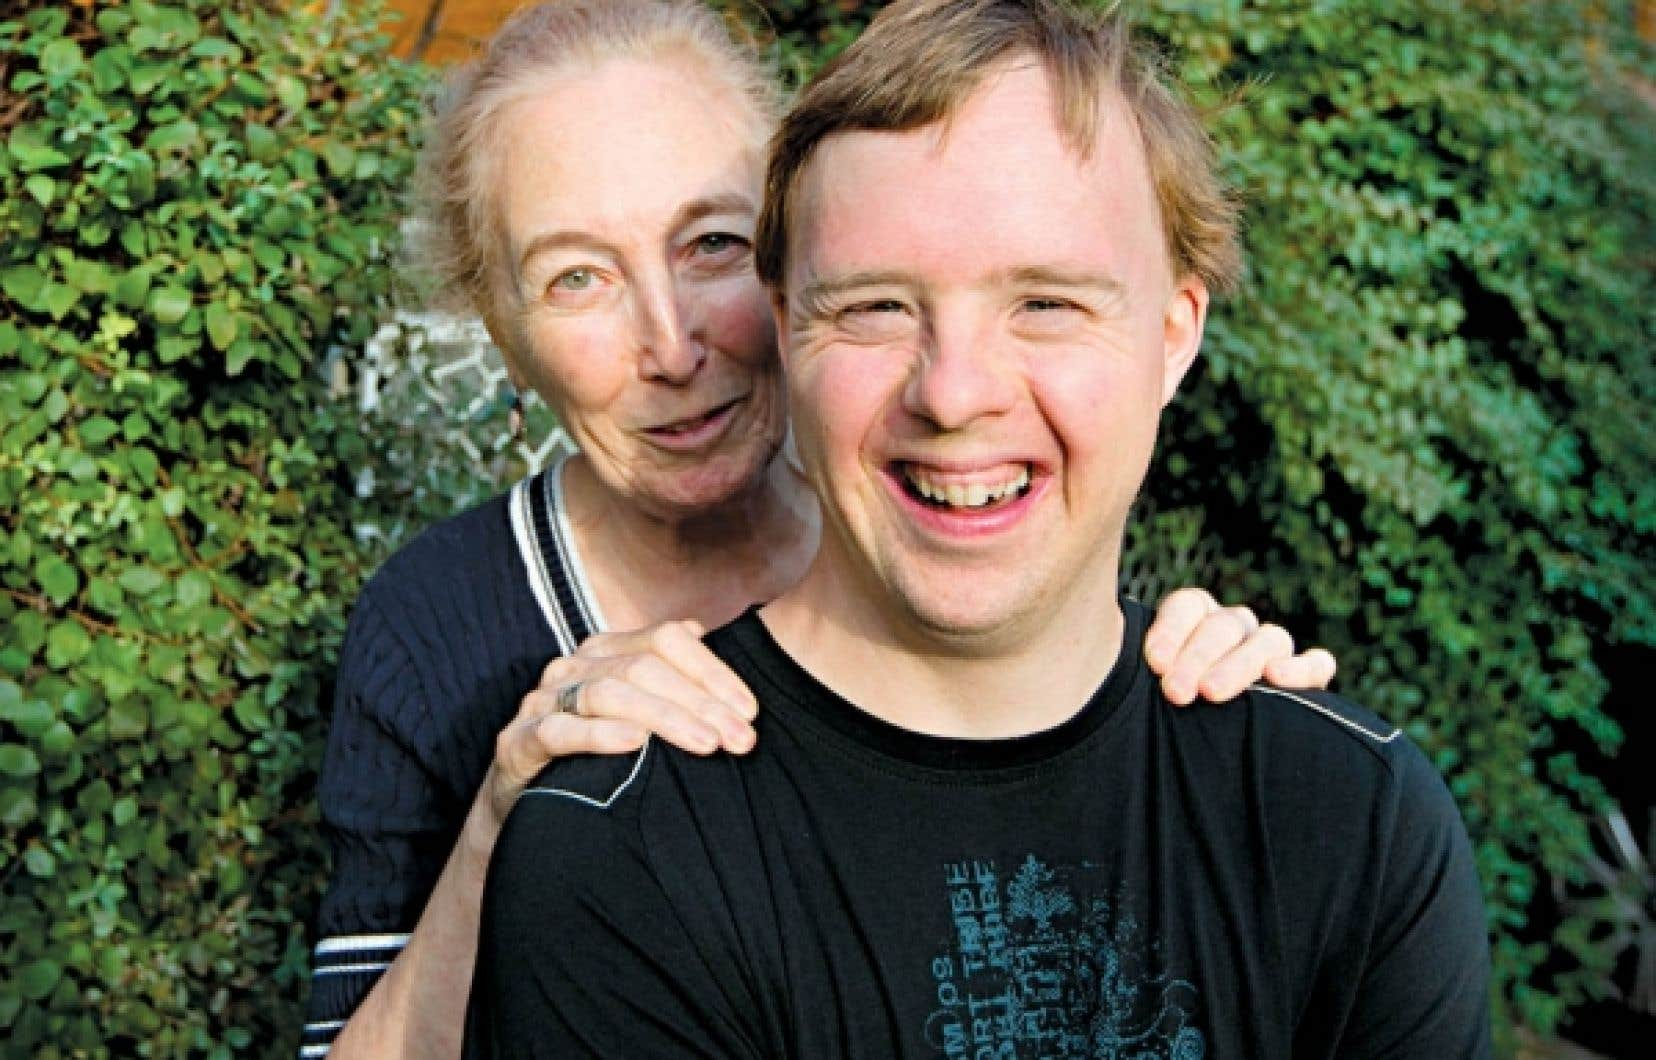 Monique Hennebert et son fils, Carl Hennebert-Faulkner, maintenant &acirc;g&eacute; de 35 ans.<br />